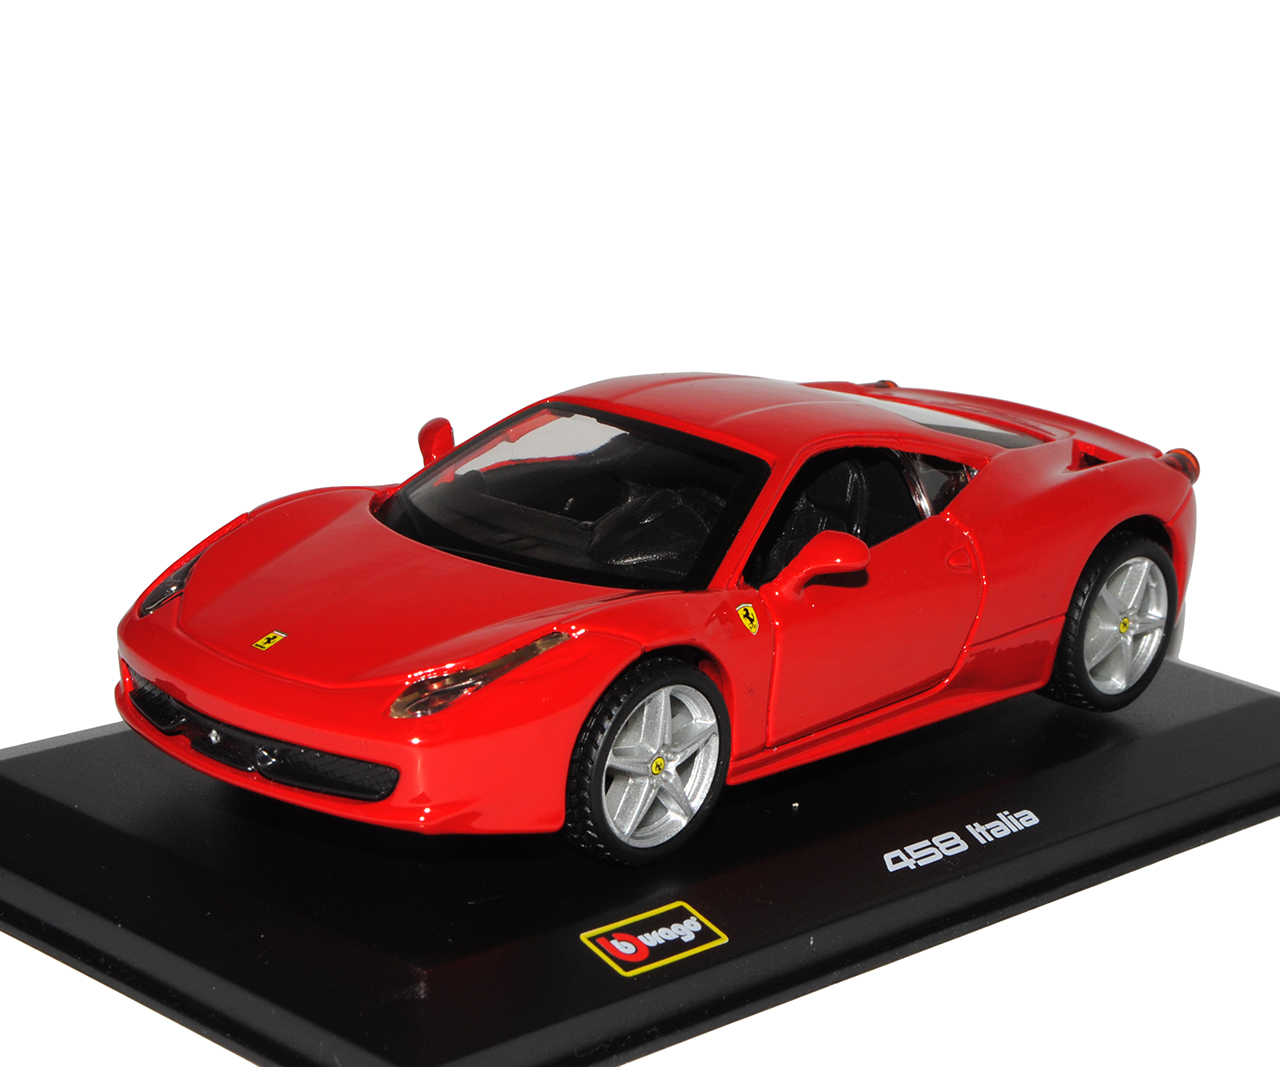 Ferrari 458 Italia Coupe Rot Ab 2009 mit Sockel und Vitrine 1//32 Bburago Model..